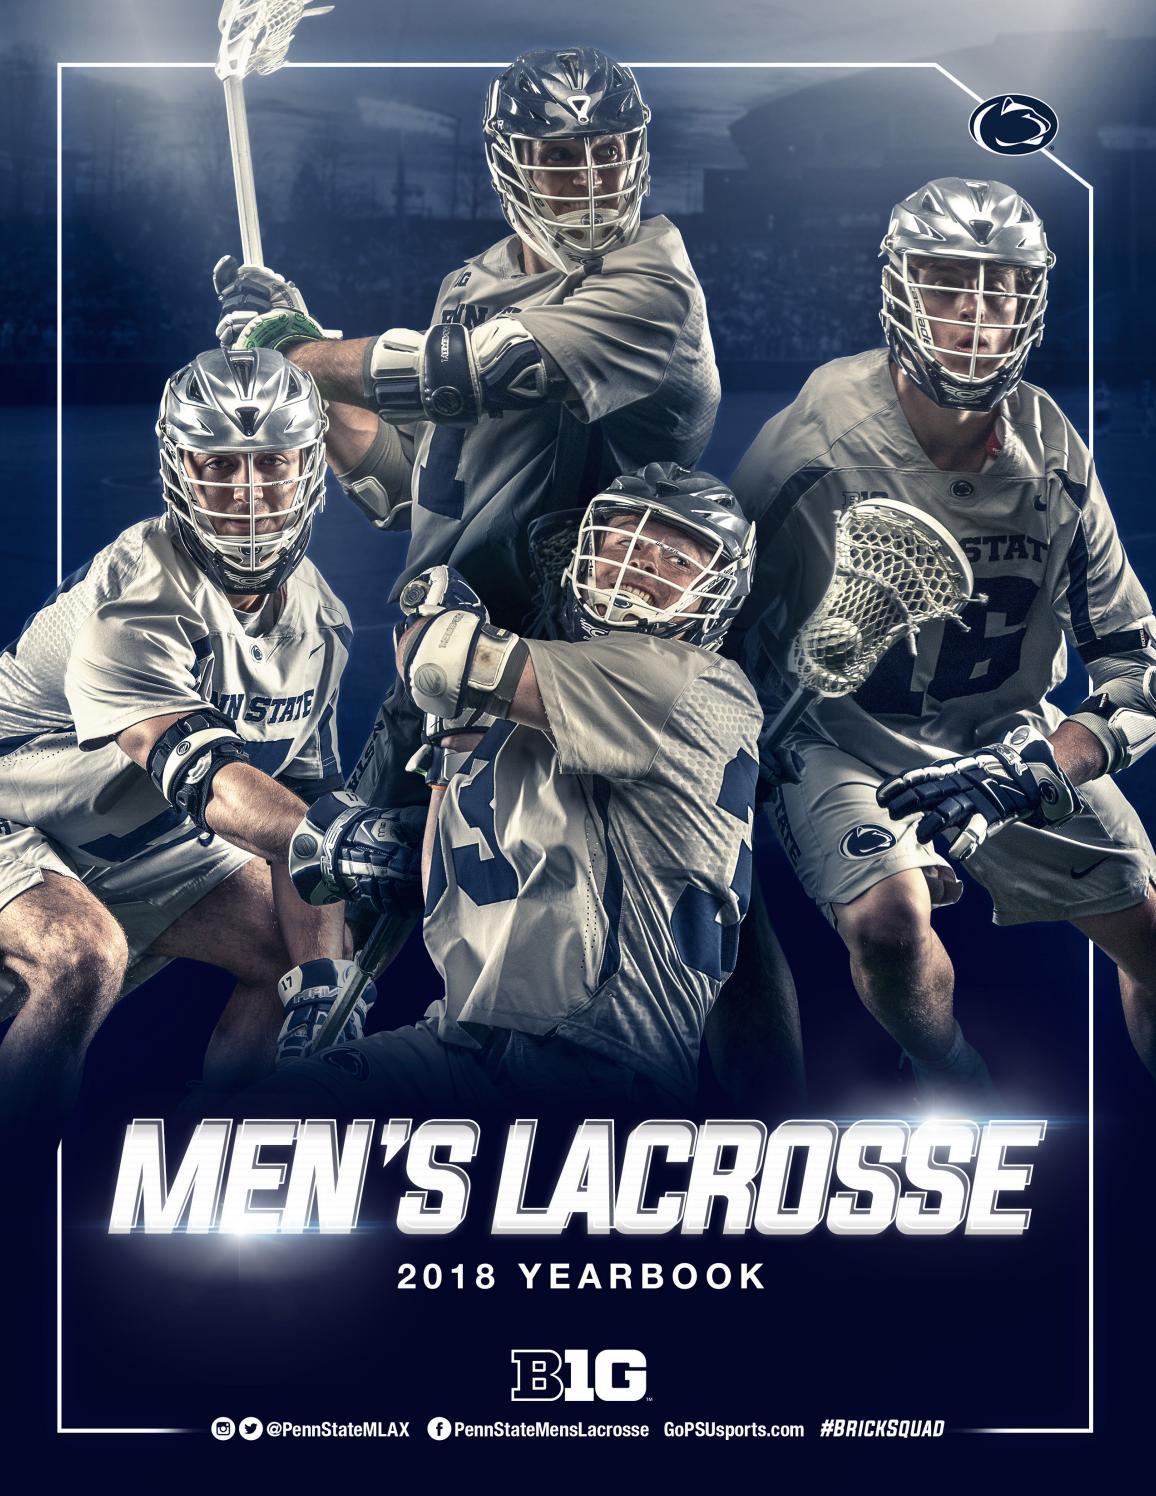 2018 penn state men s lacrosse yearbook by penn state athletics issuu 2018 penn state men s lacrosse yearbook